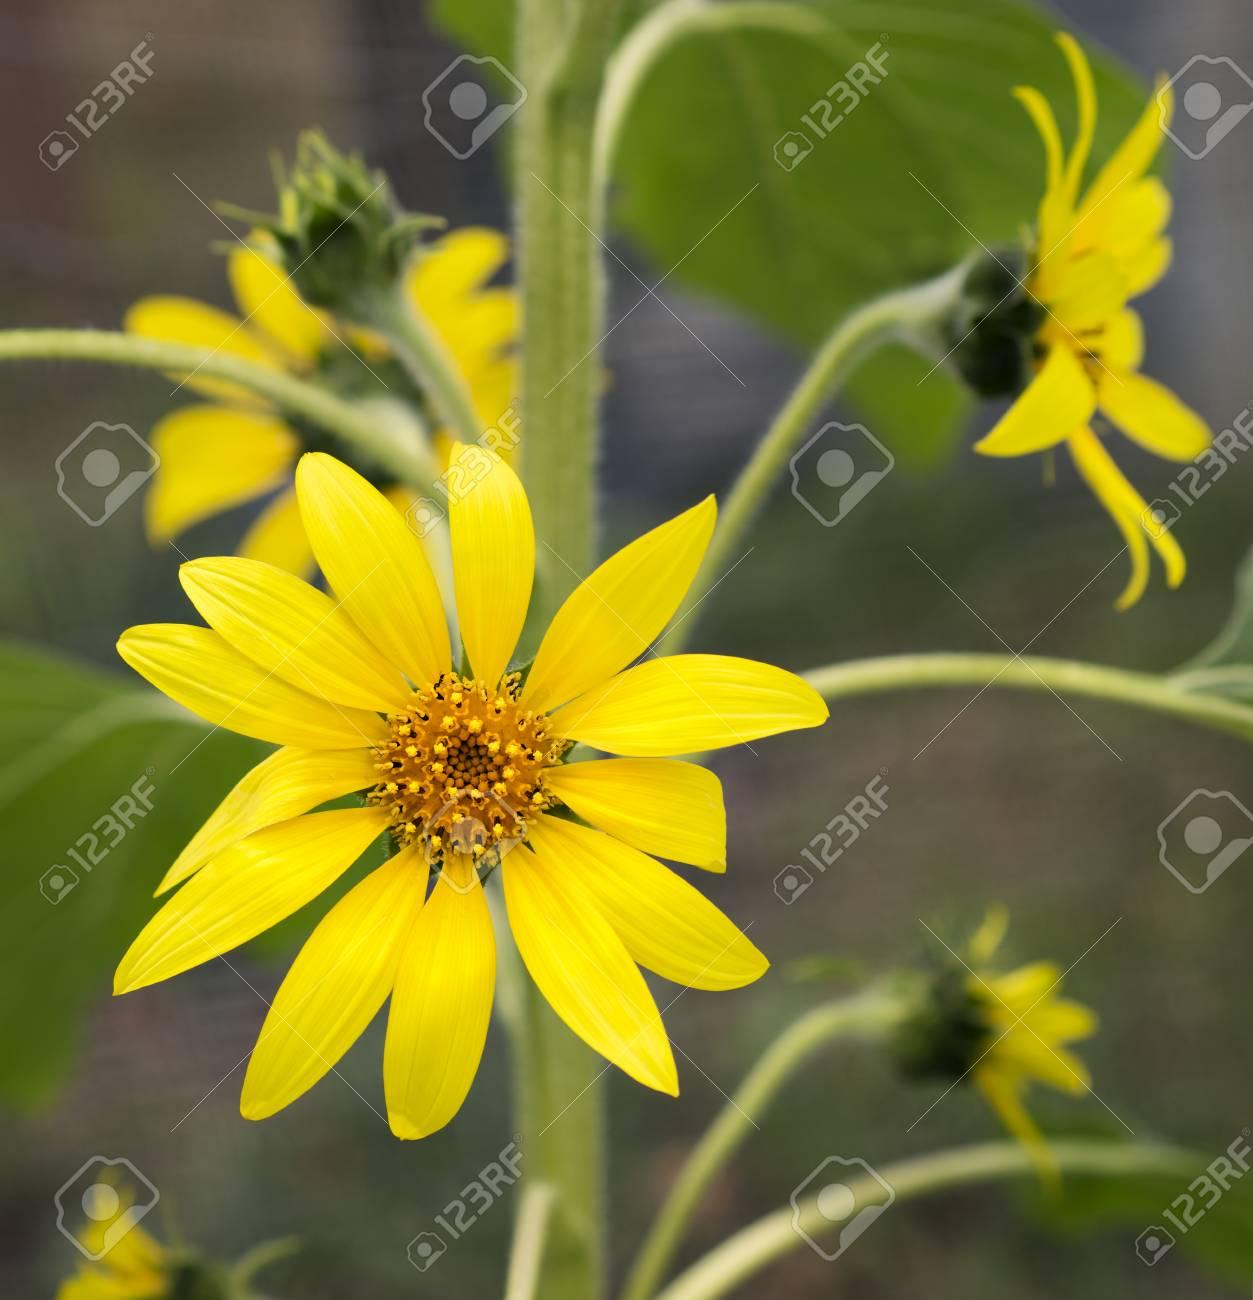 Bright golden sunflowers happy yellow flowers growing in the bright golden sunflowers happy yellow flowers growing in the garden symbolic of bounty mightylinksfo